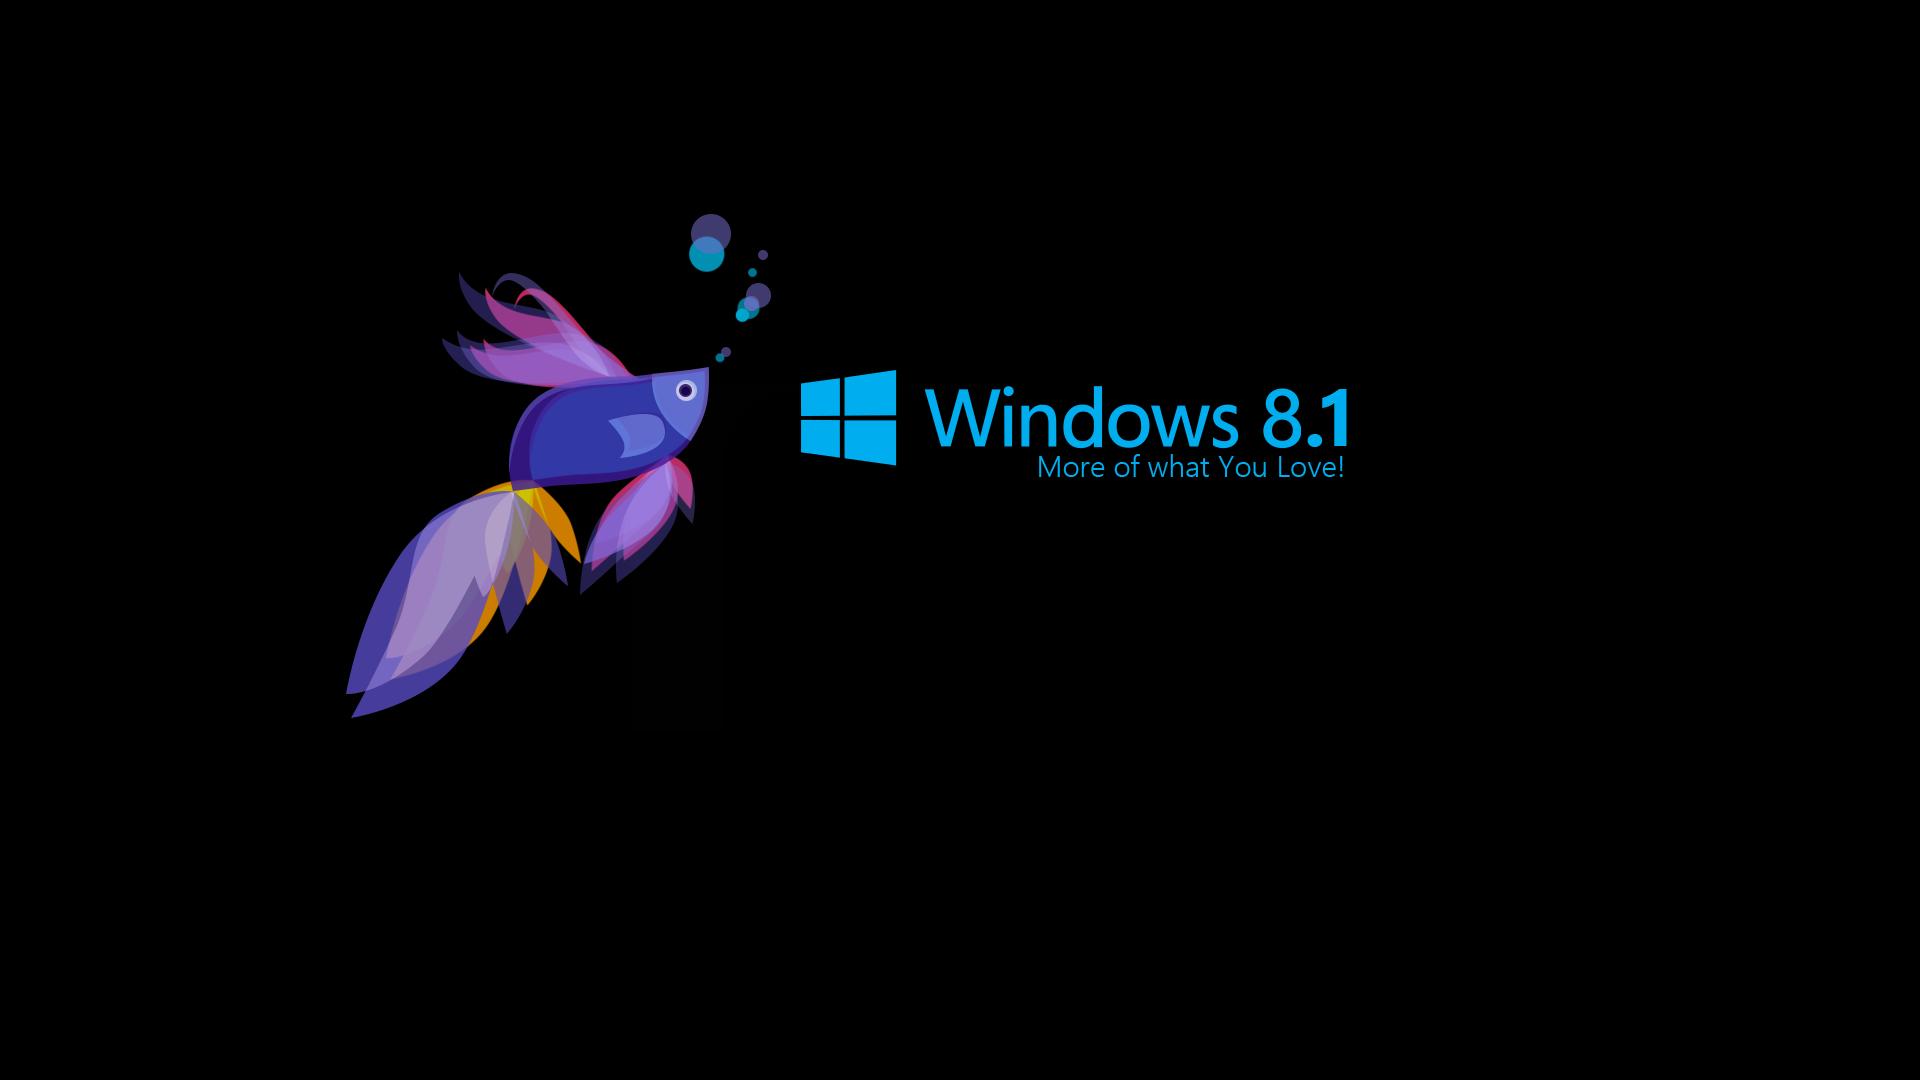 Download Wallpapers HD windows 81 Desktop WIdescreen 1920x1080